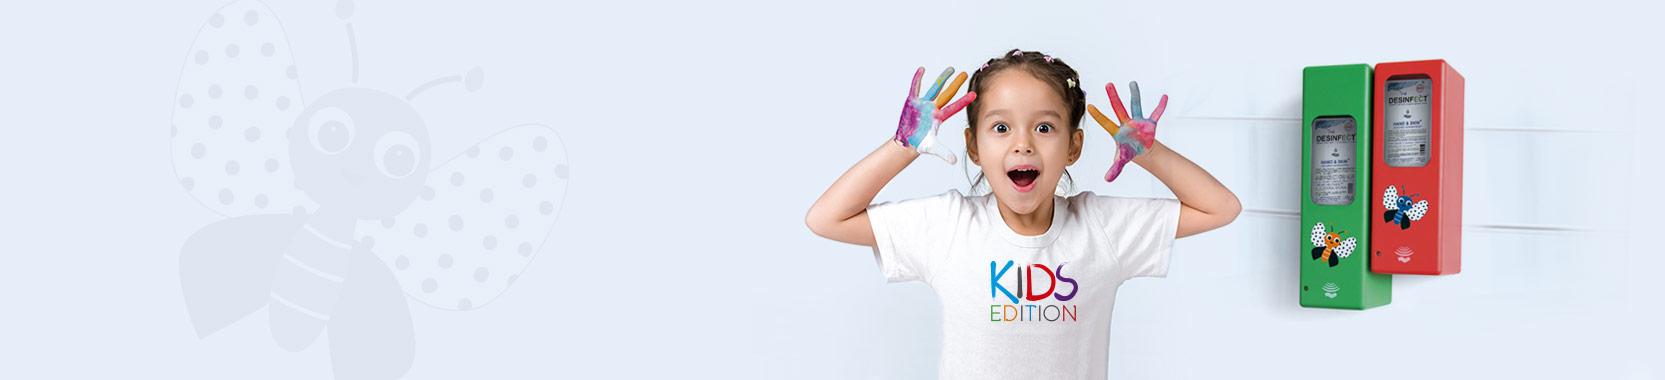 Kids Edition Schmetterling